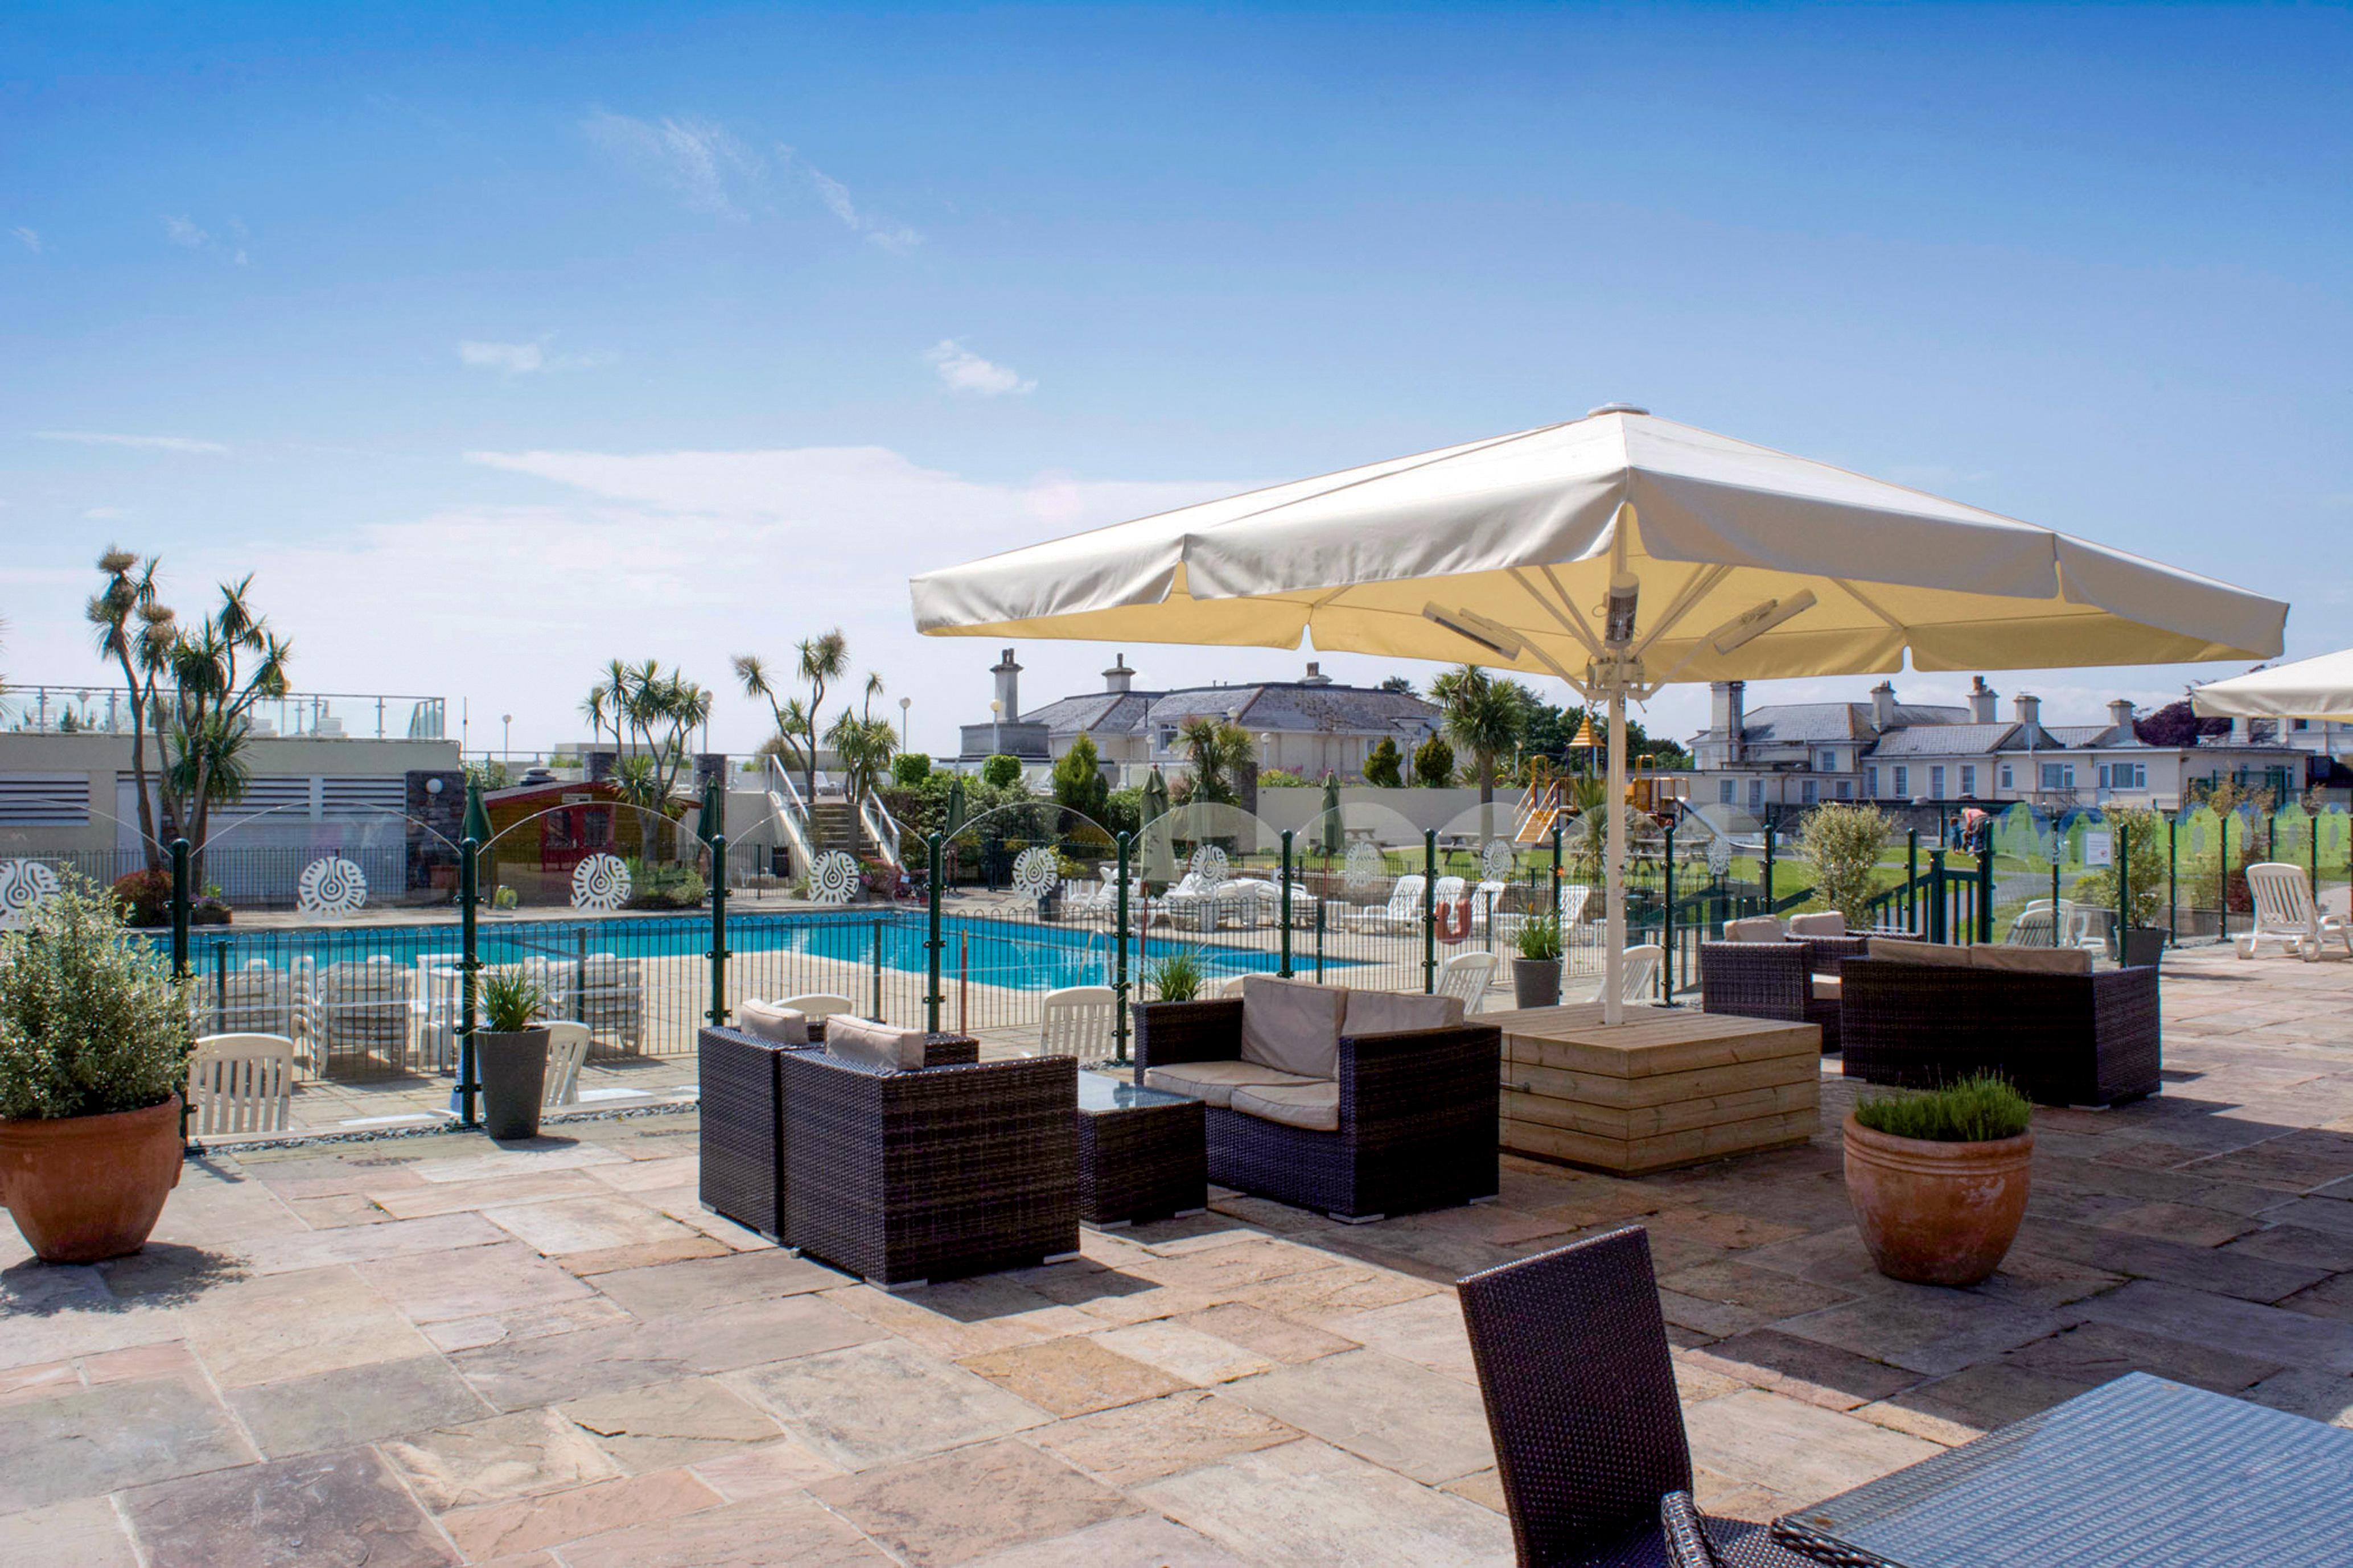 Aztec Bistro Terrace TLH Leisure Resort, Torquay